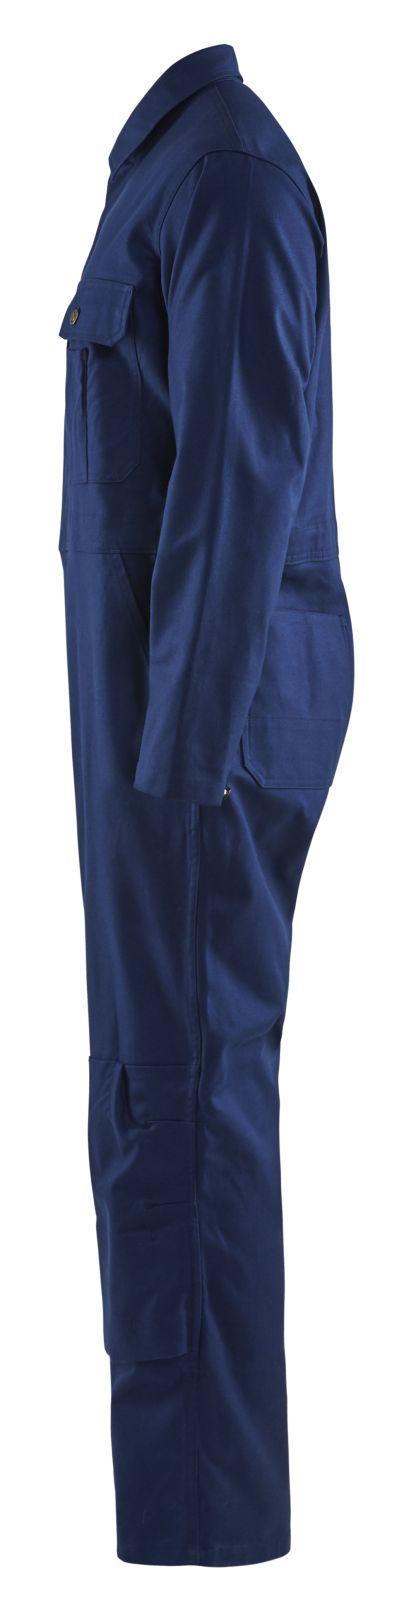 Blaklader Overalls 61511100 marineblauw(8800)